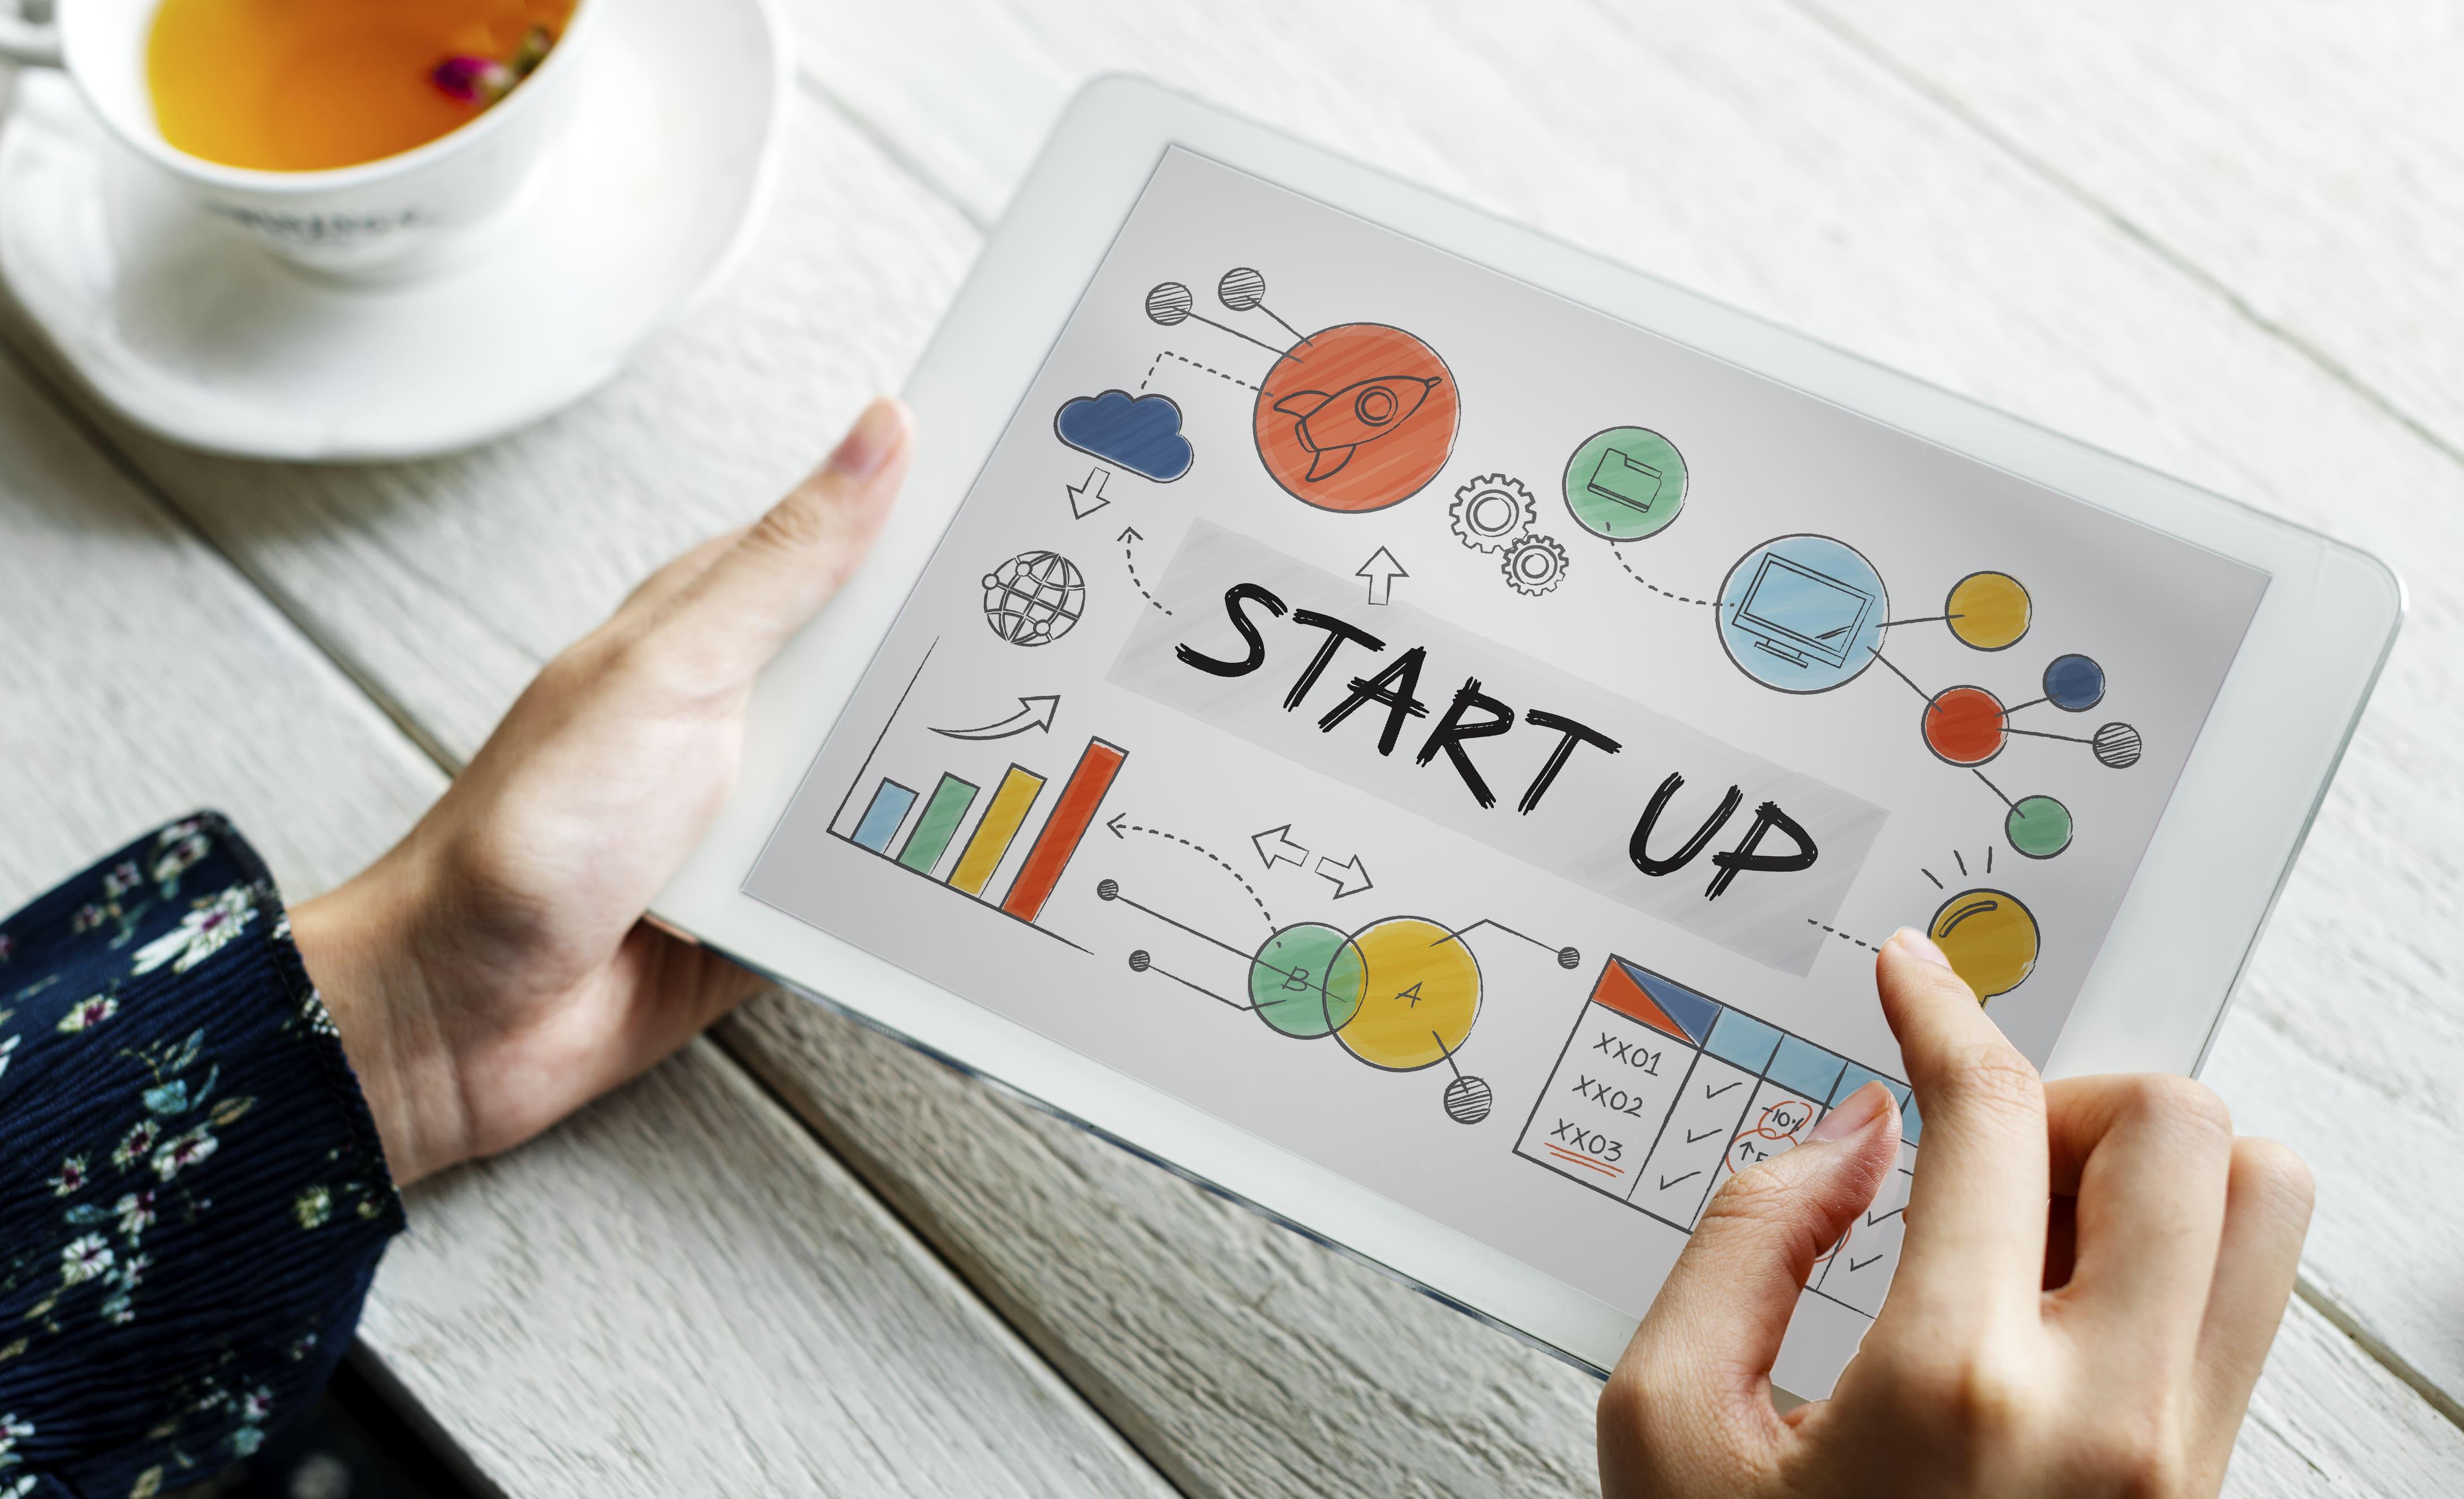 MentorApp se destaca entre mais de 16 mil Startups